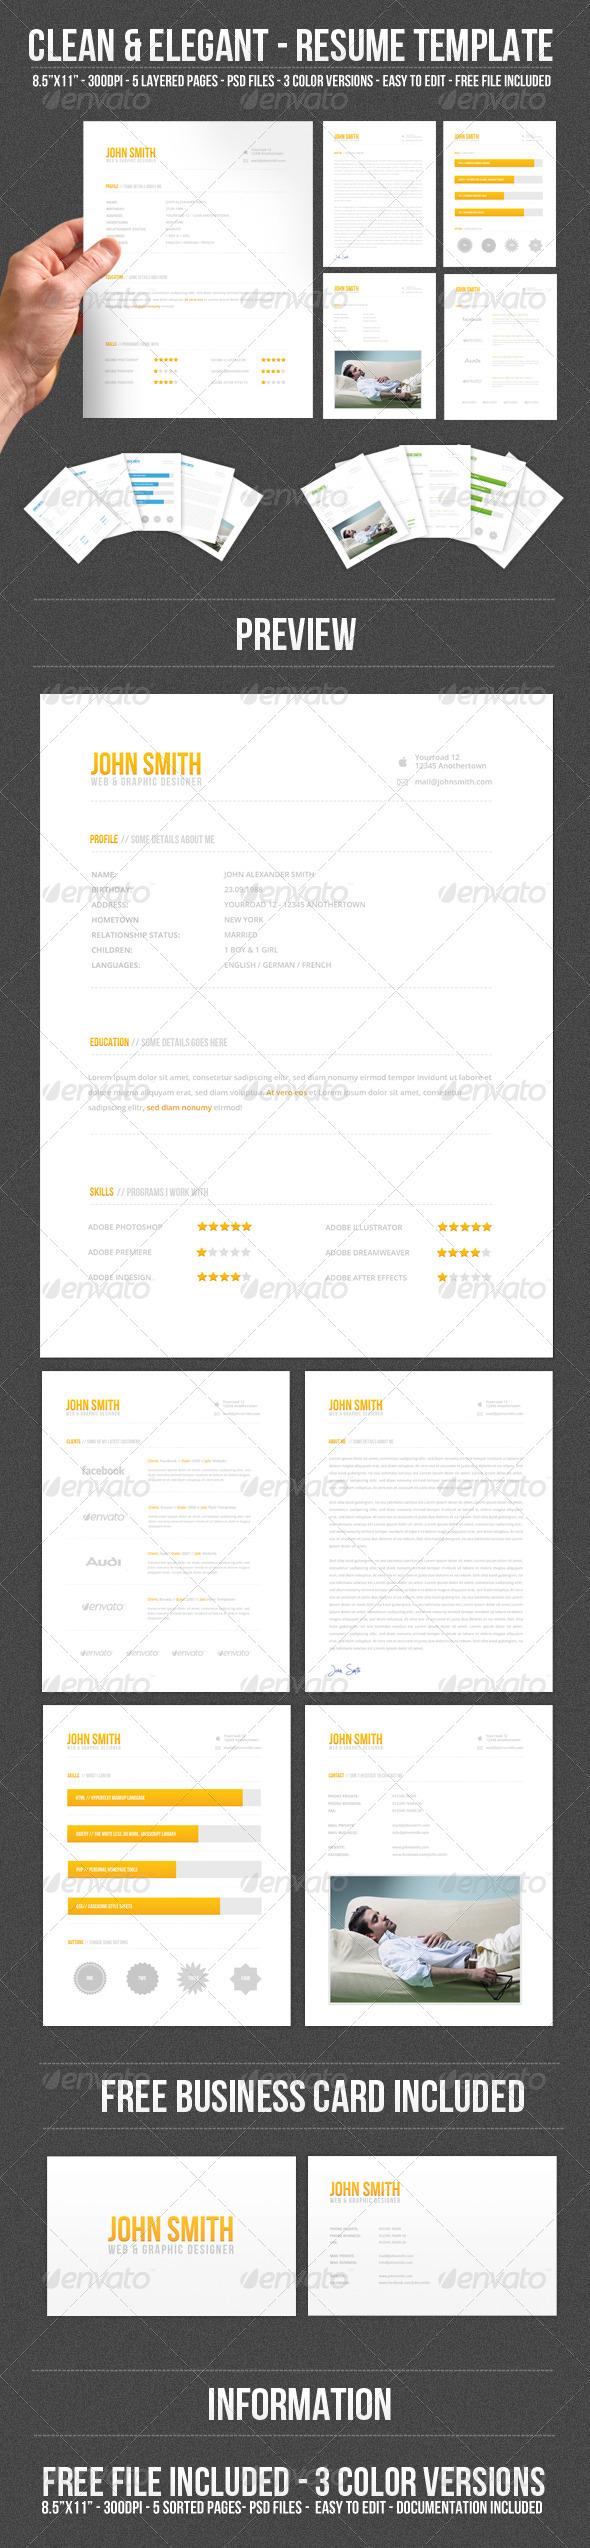 Clean & Elegant - Resume Template - Resumes Stationery